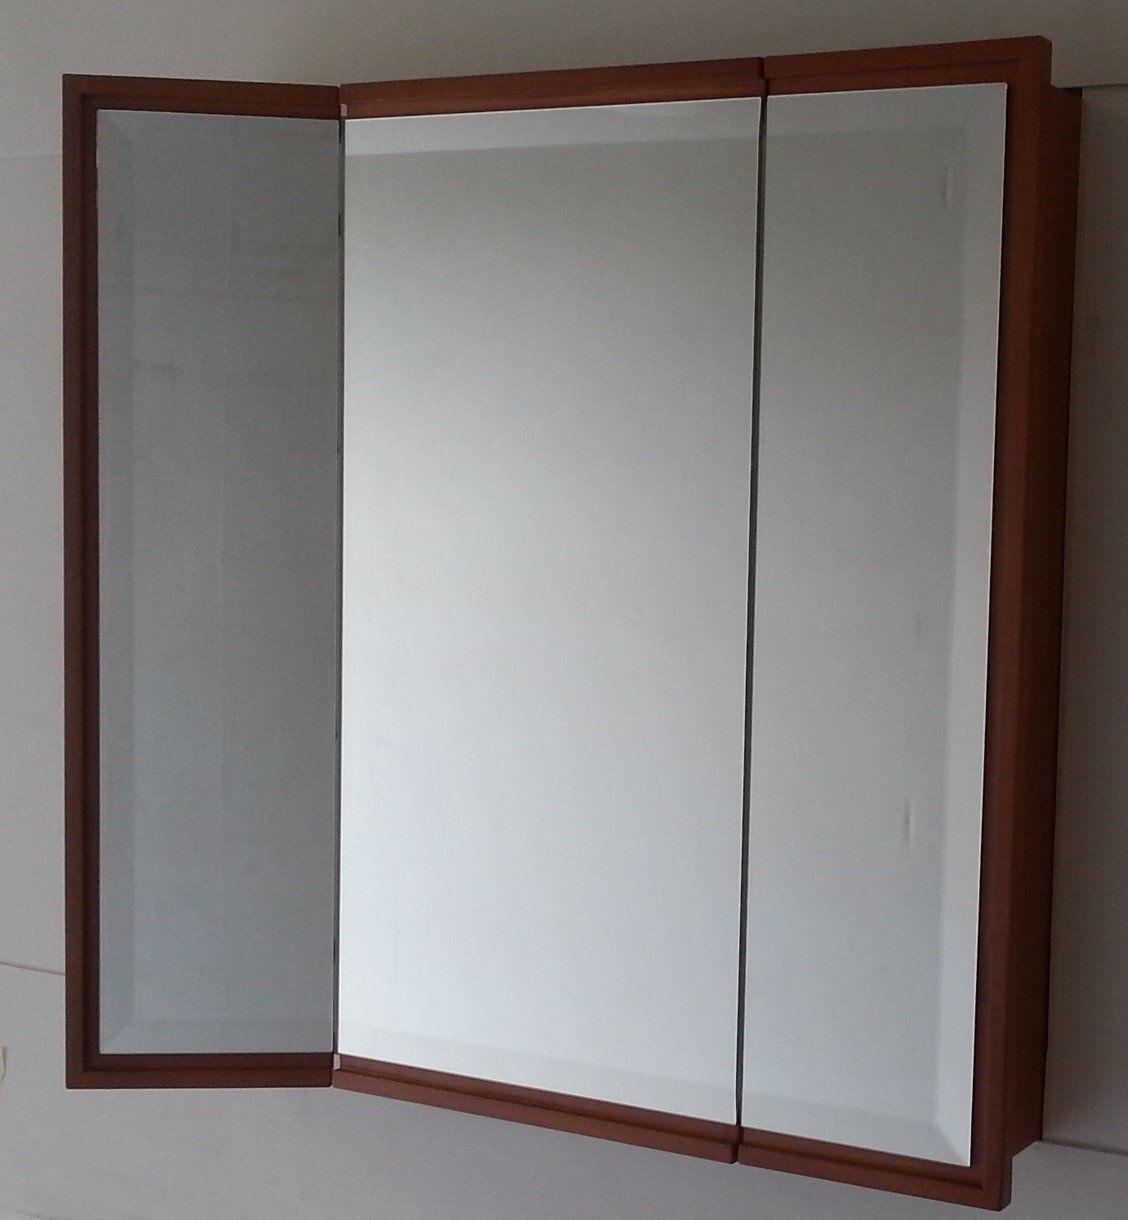 48 Medicine Cabinet Amazon  Wooden Medicine Cabinet  Cinnamon Maple Wood Framed 1